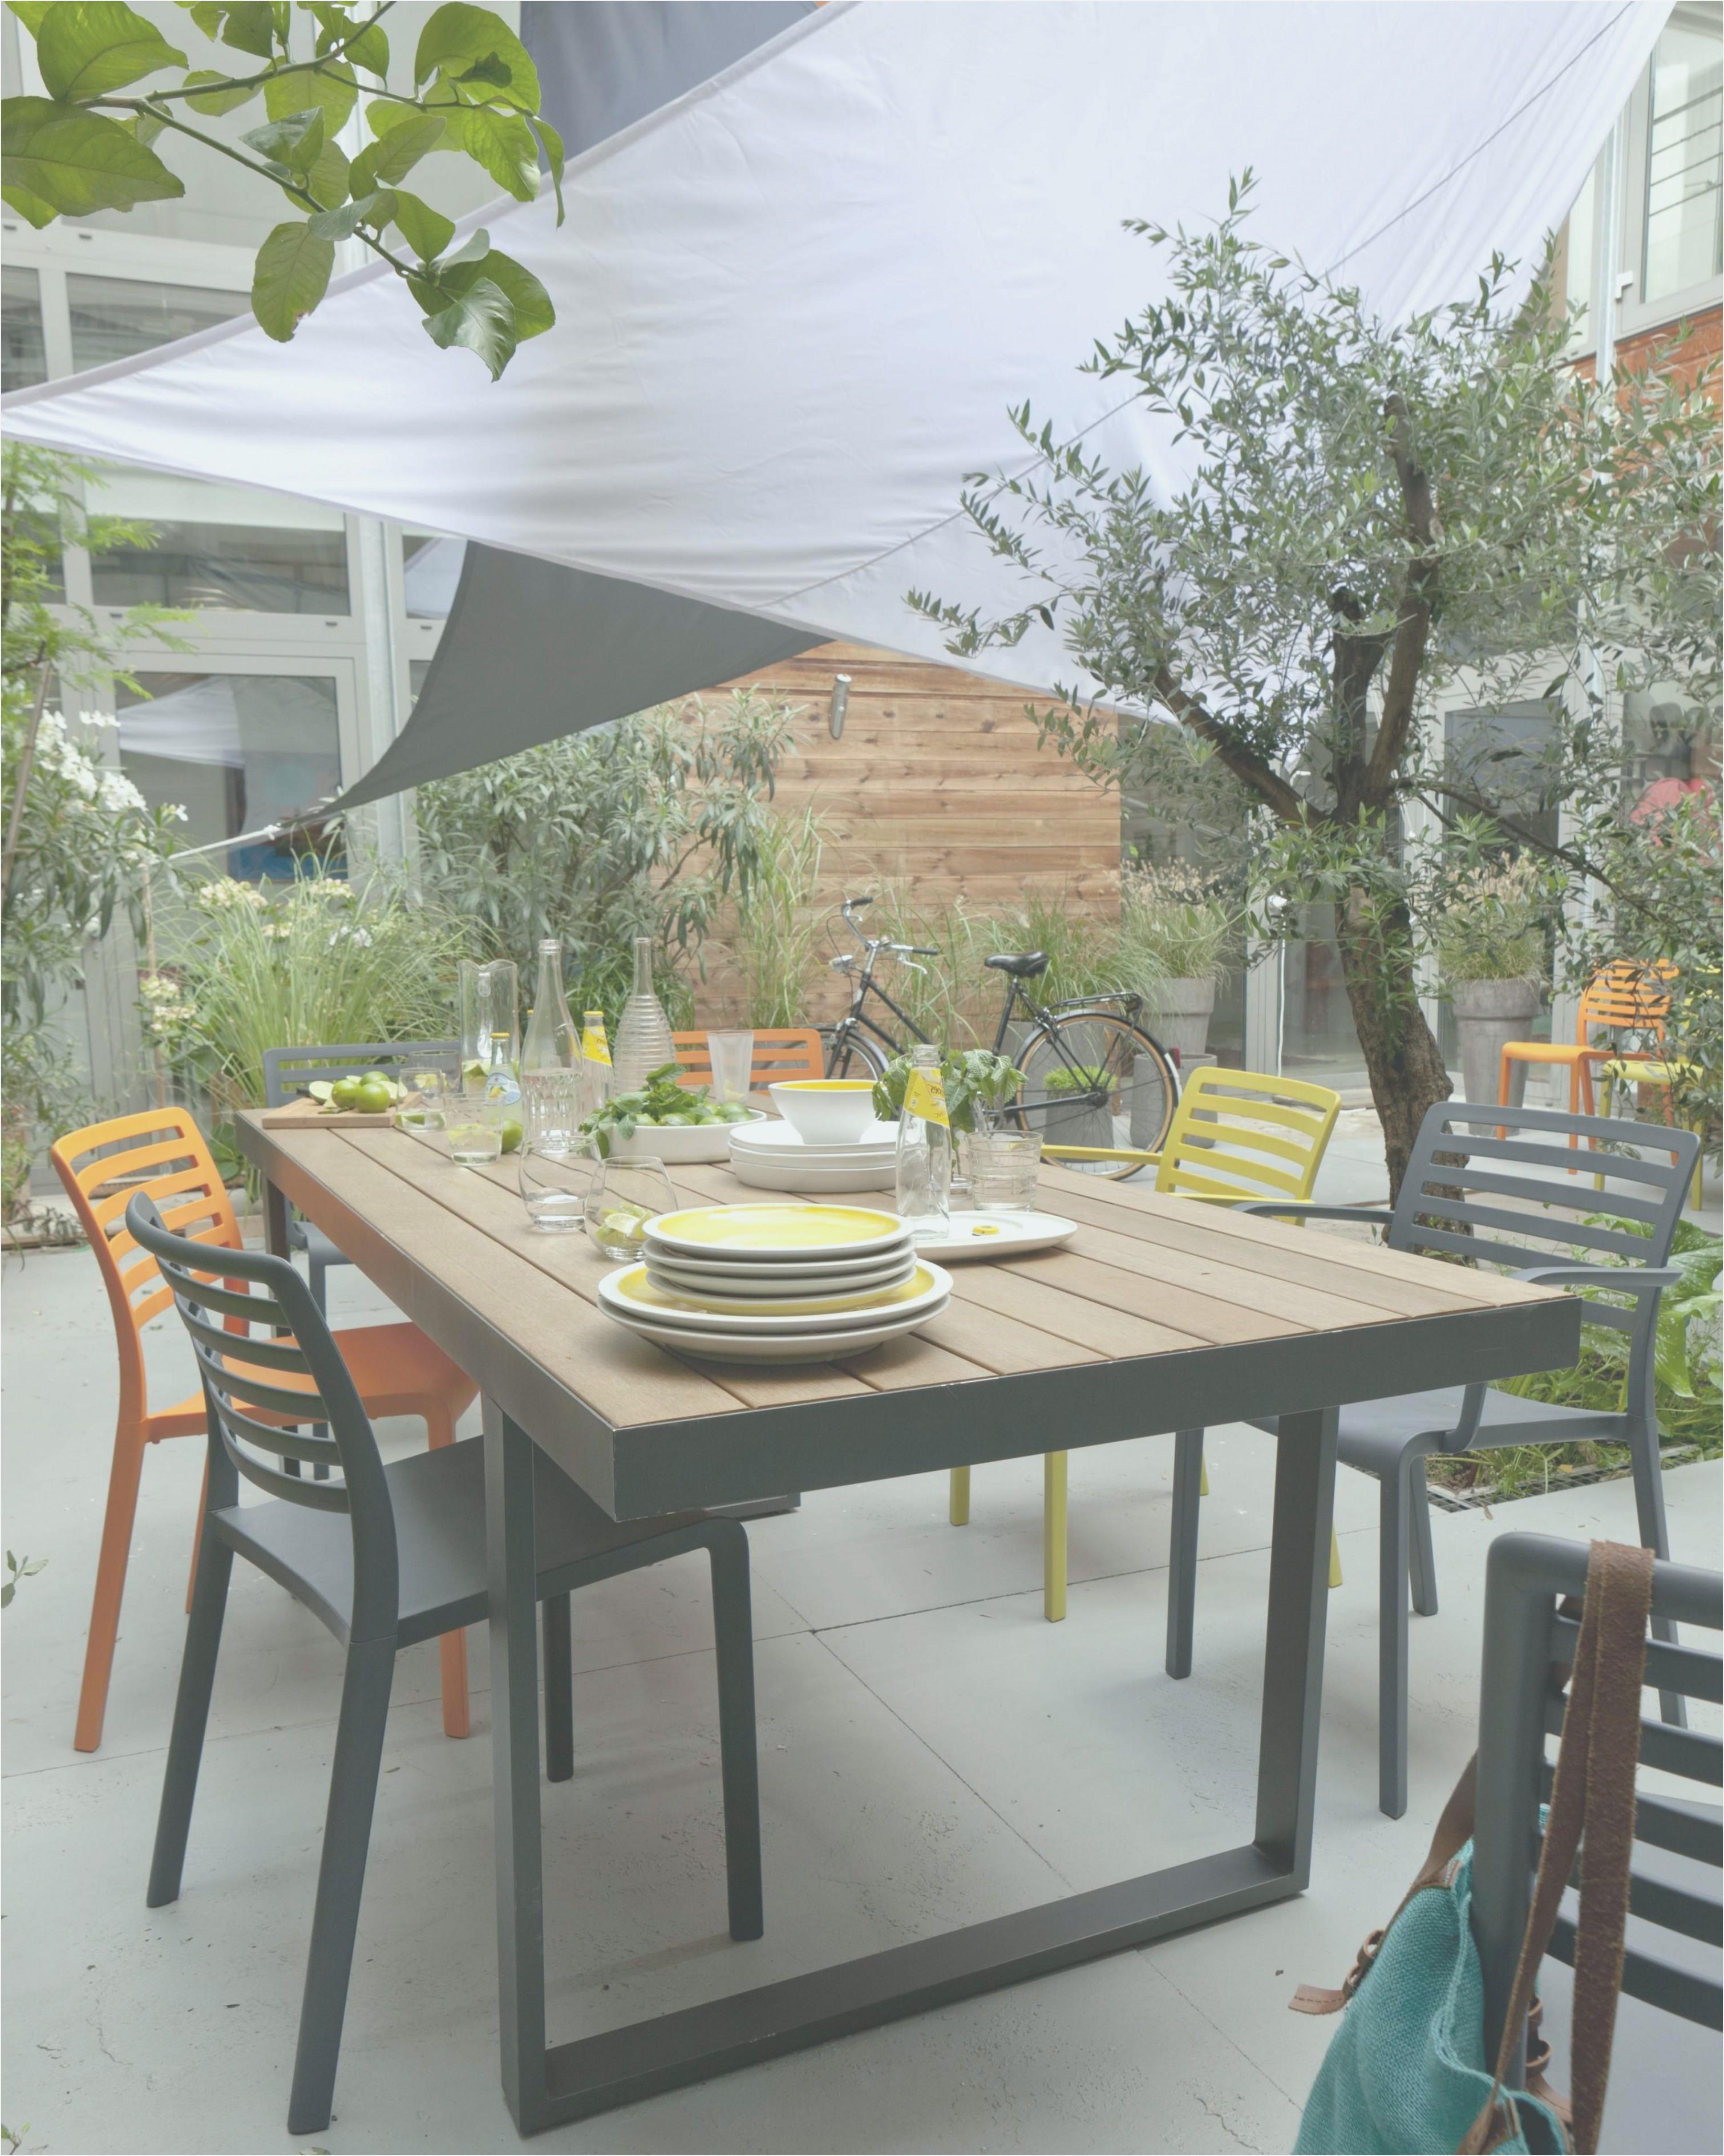 Meuble De Jardin Gifi Beau Stock Table De Jardin Pas Cher Gifi De élégant Armoire De Jardin Plastique